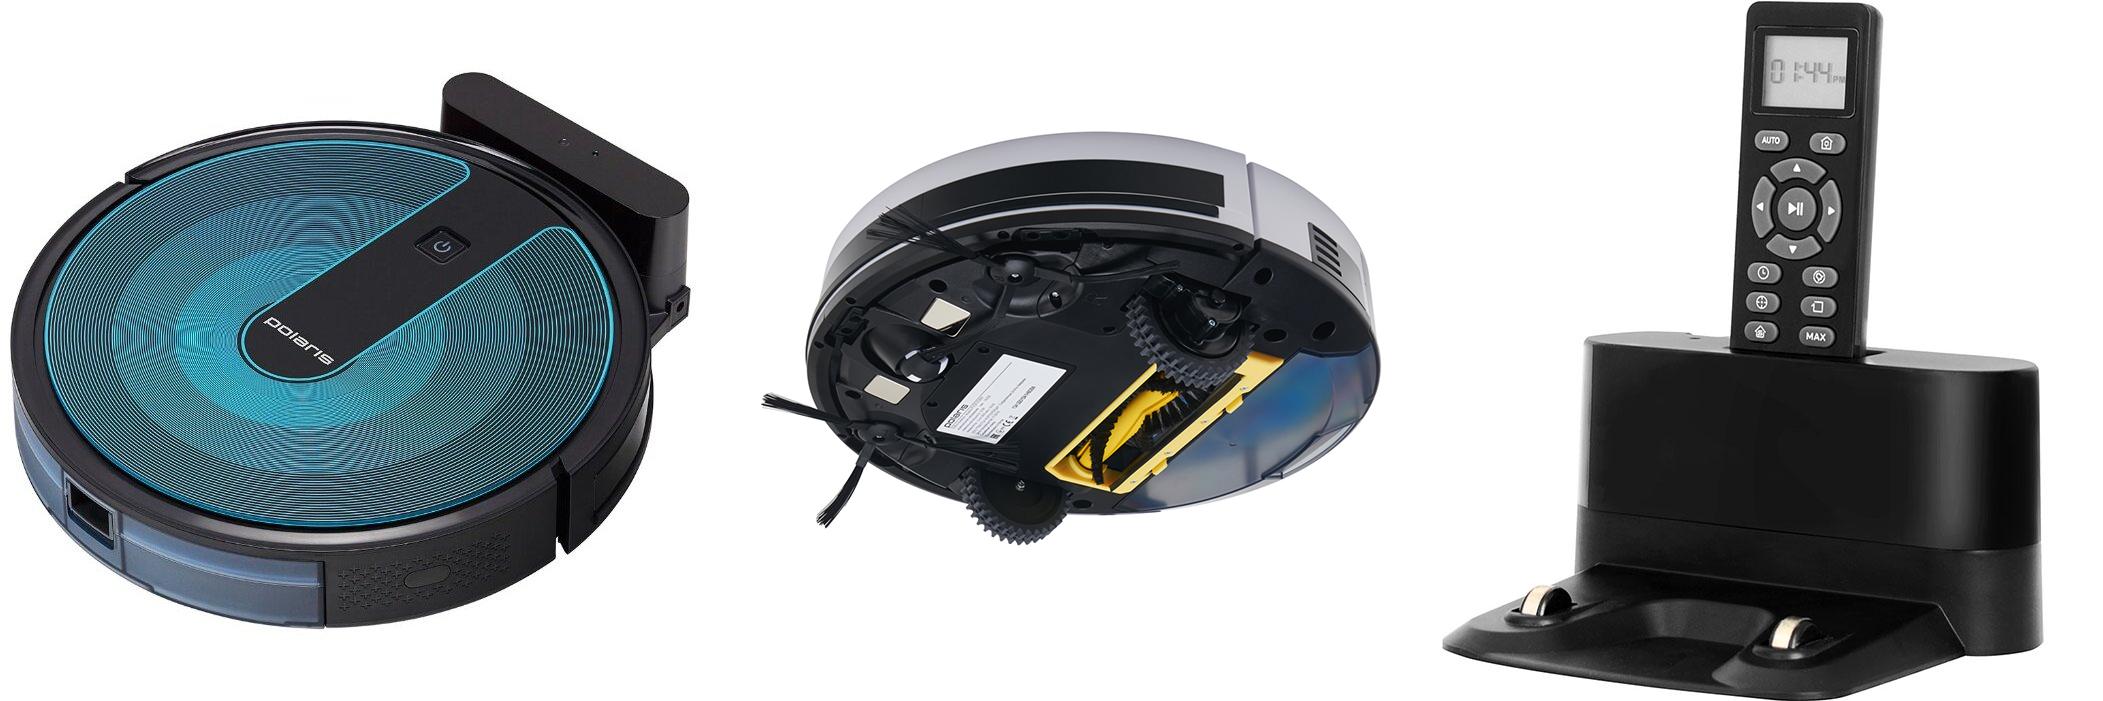 Polaris PVCR 1020 FusionPRO внешний вид